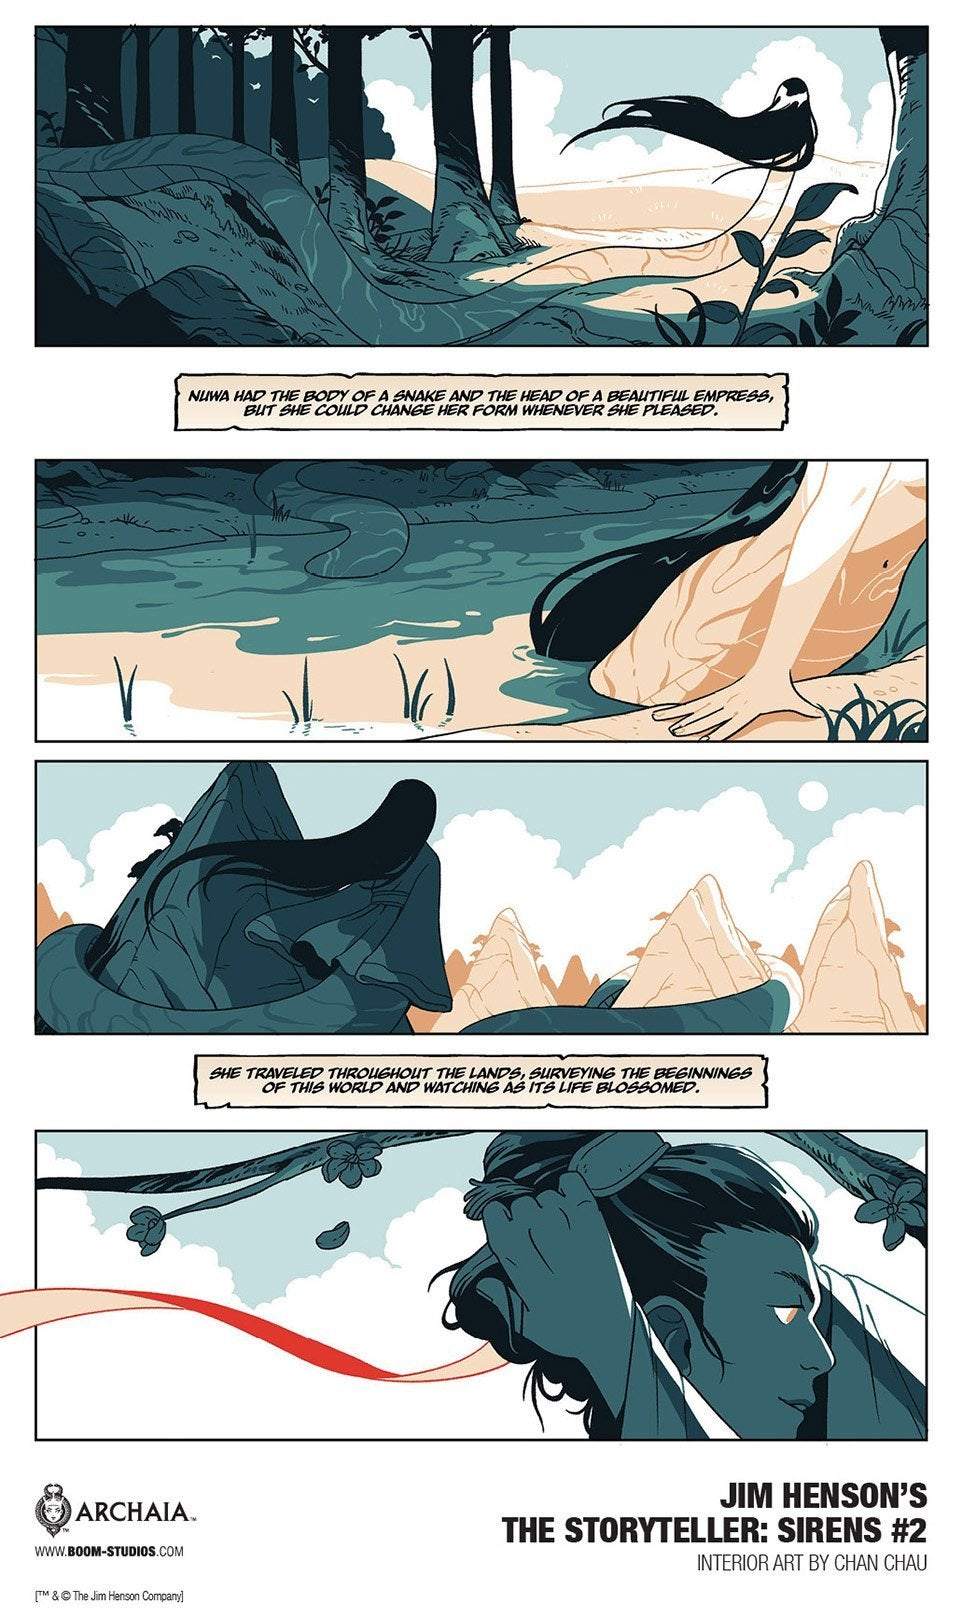 Jim-Henson-Storytellers-Sirens-2-Preview-3